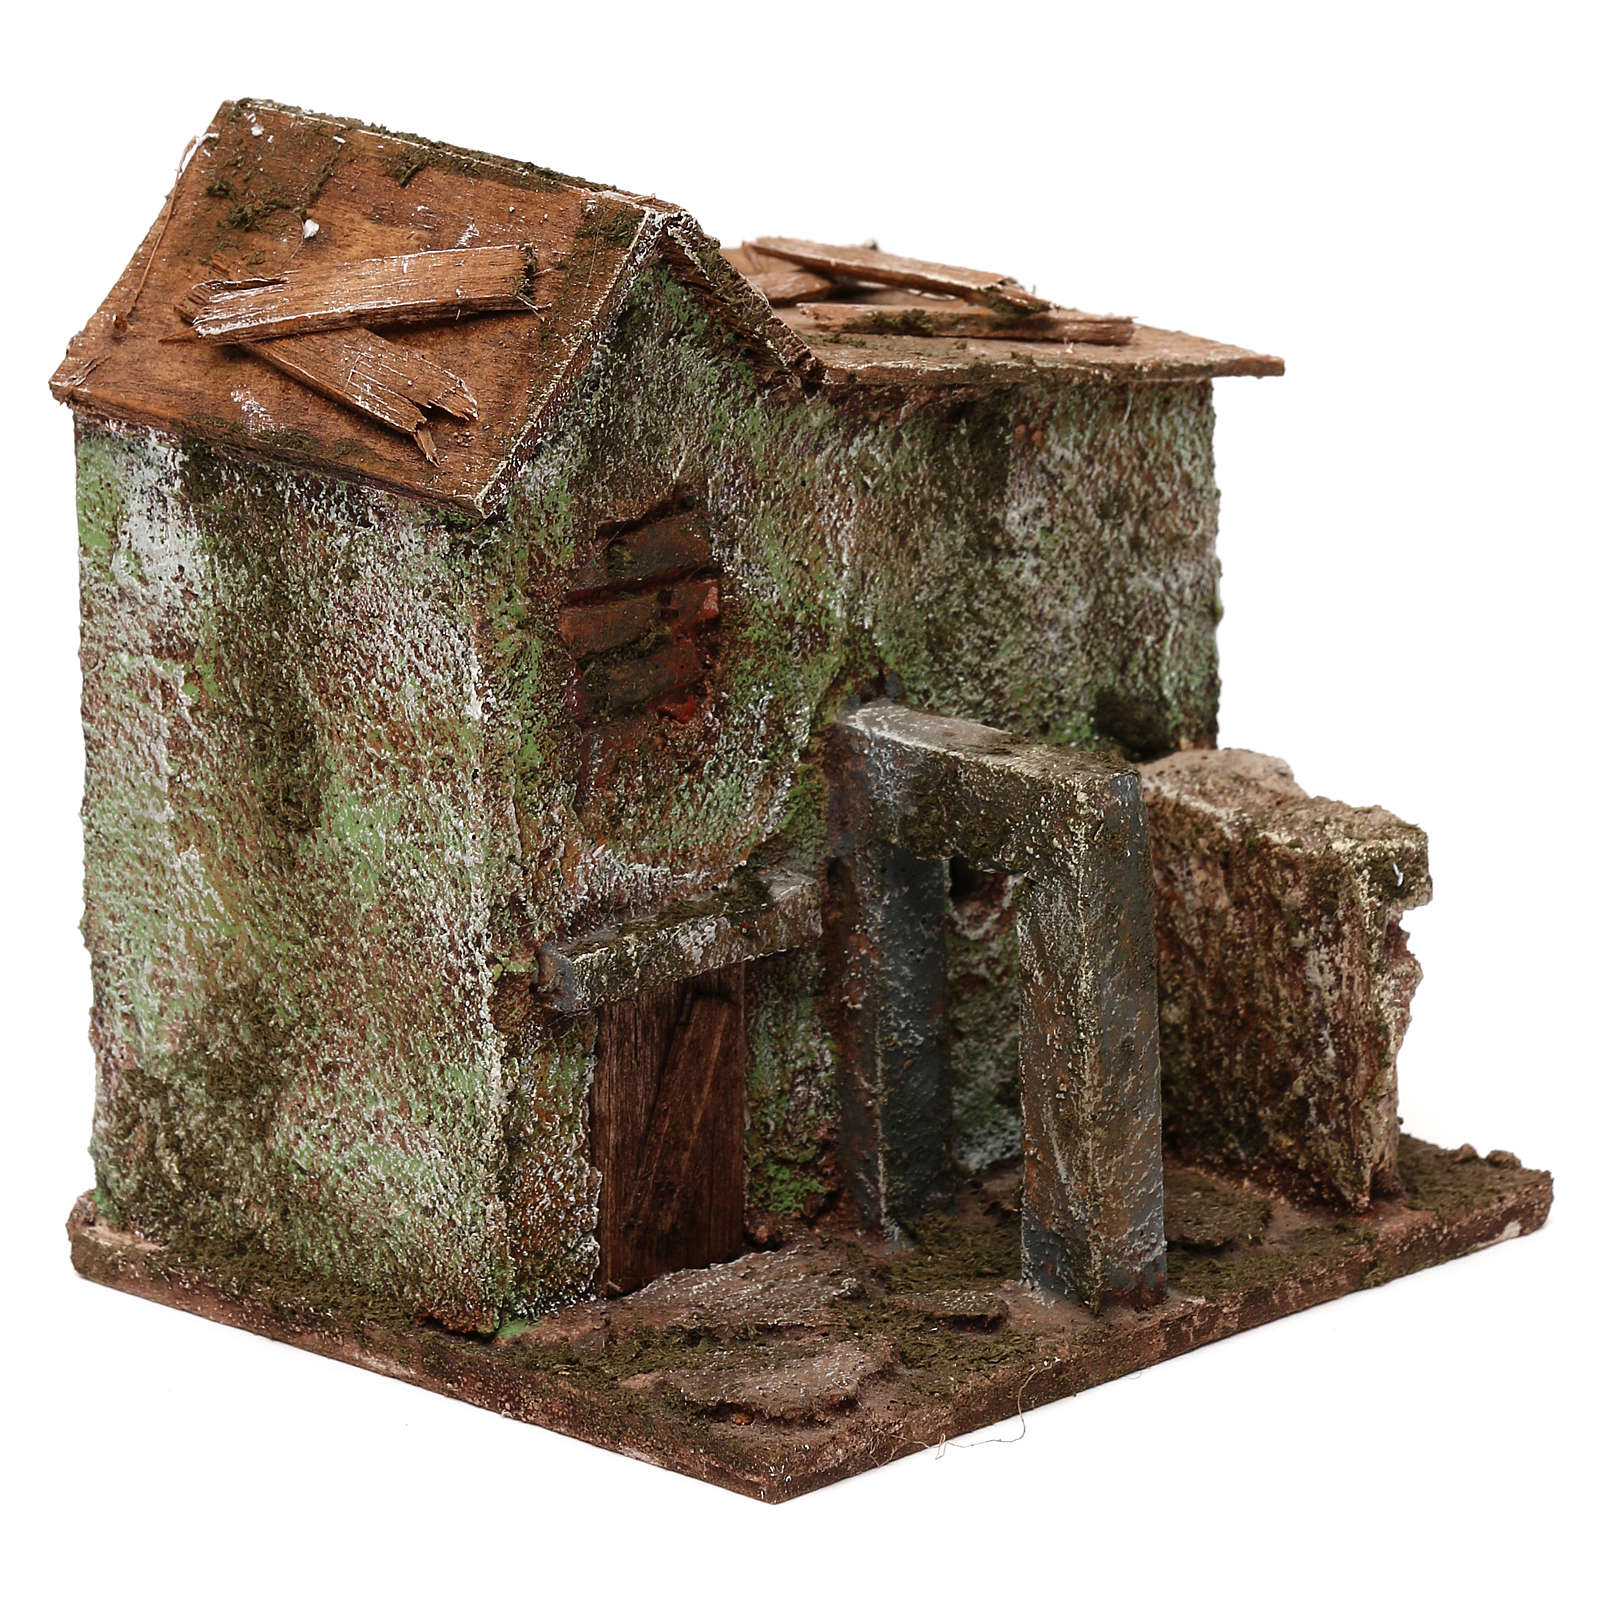 House with door for nativity scene 4